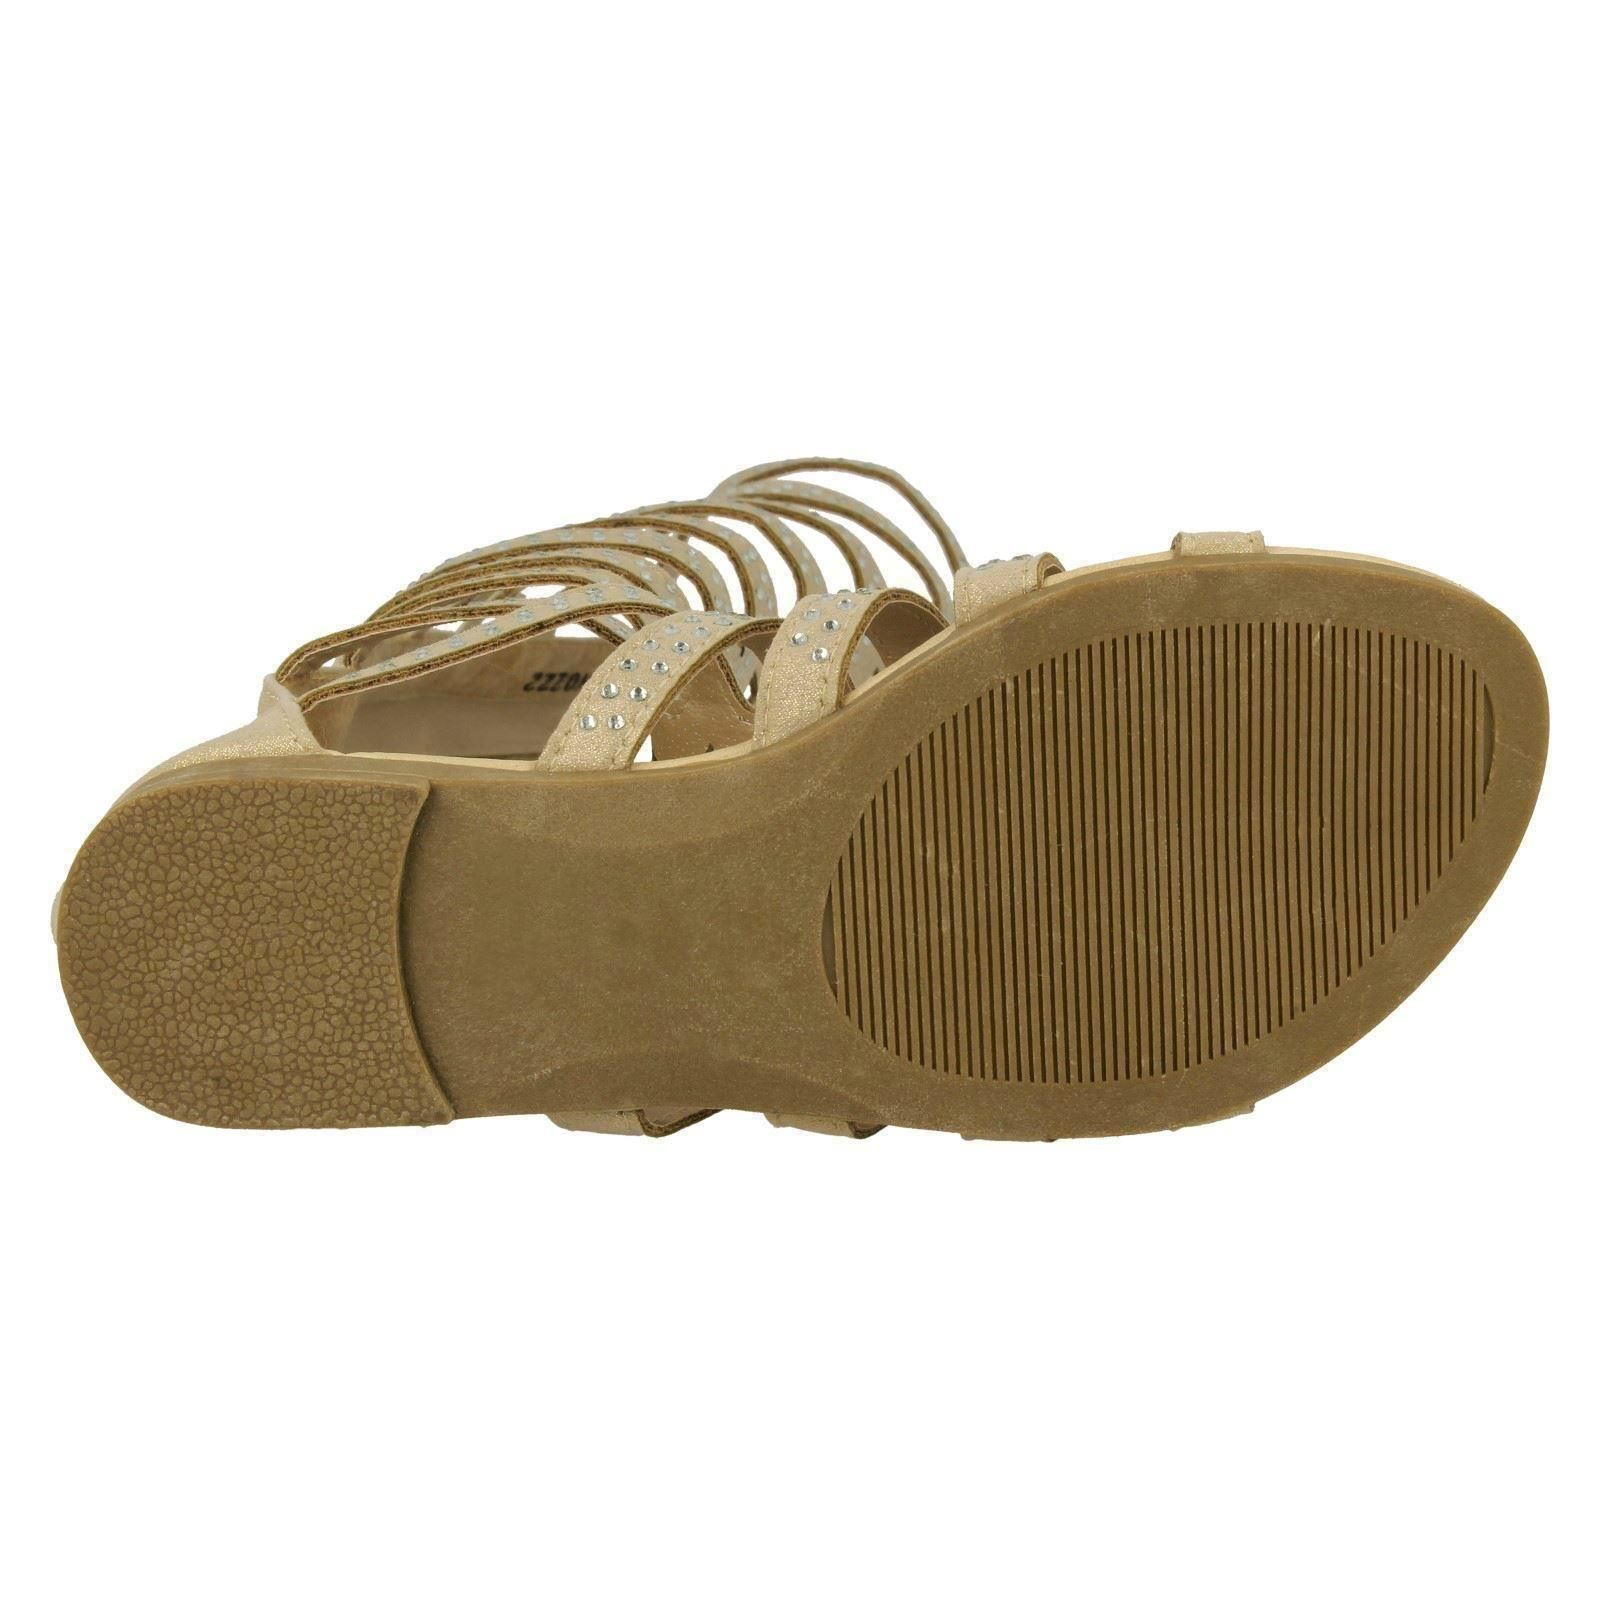 Girls Spot On Knee High Gladiator Sandals,